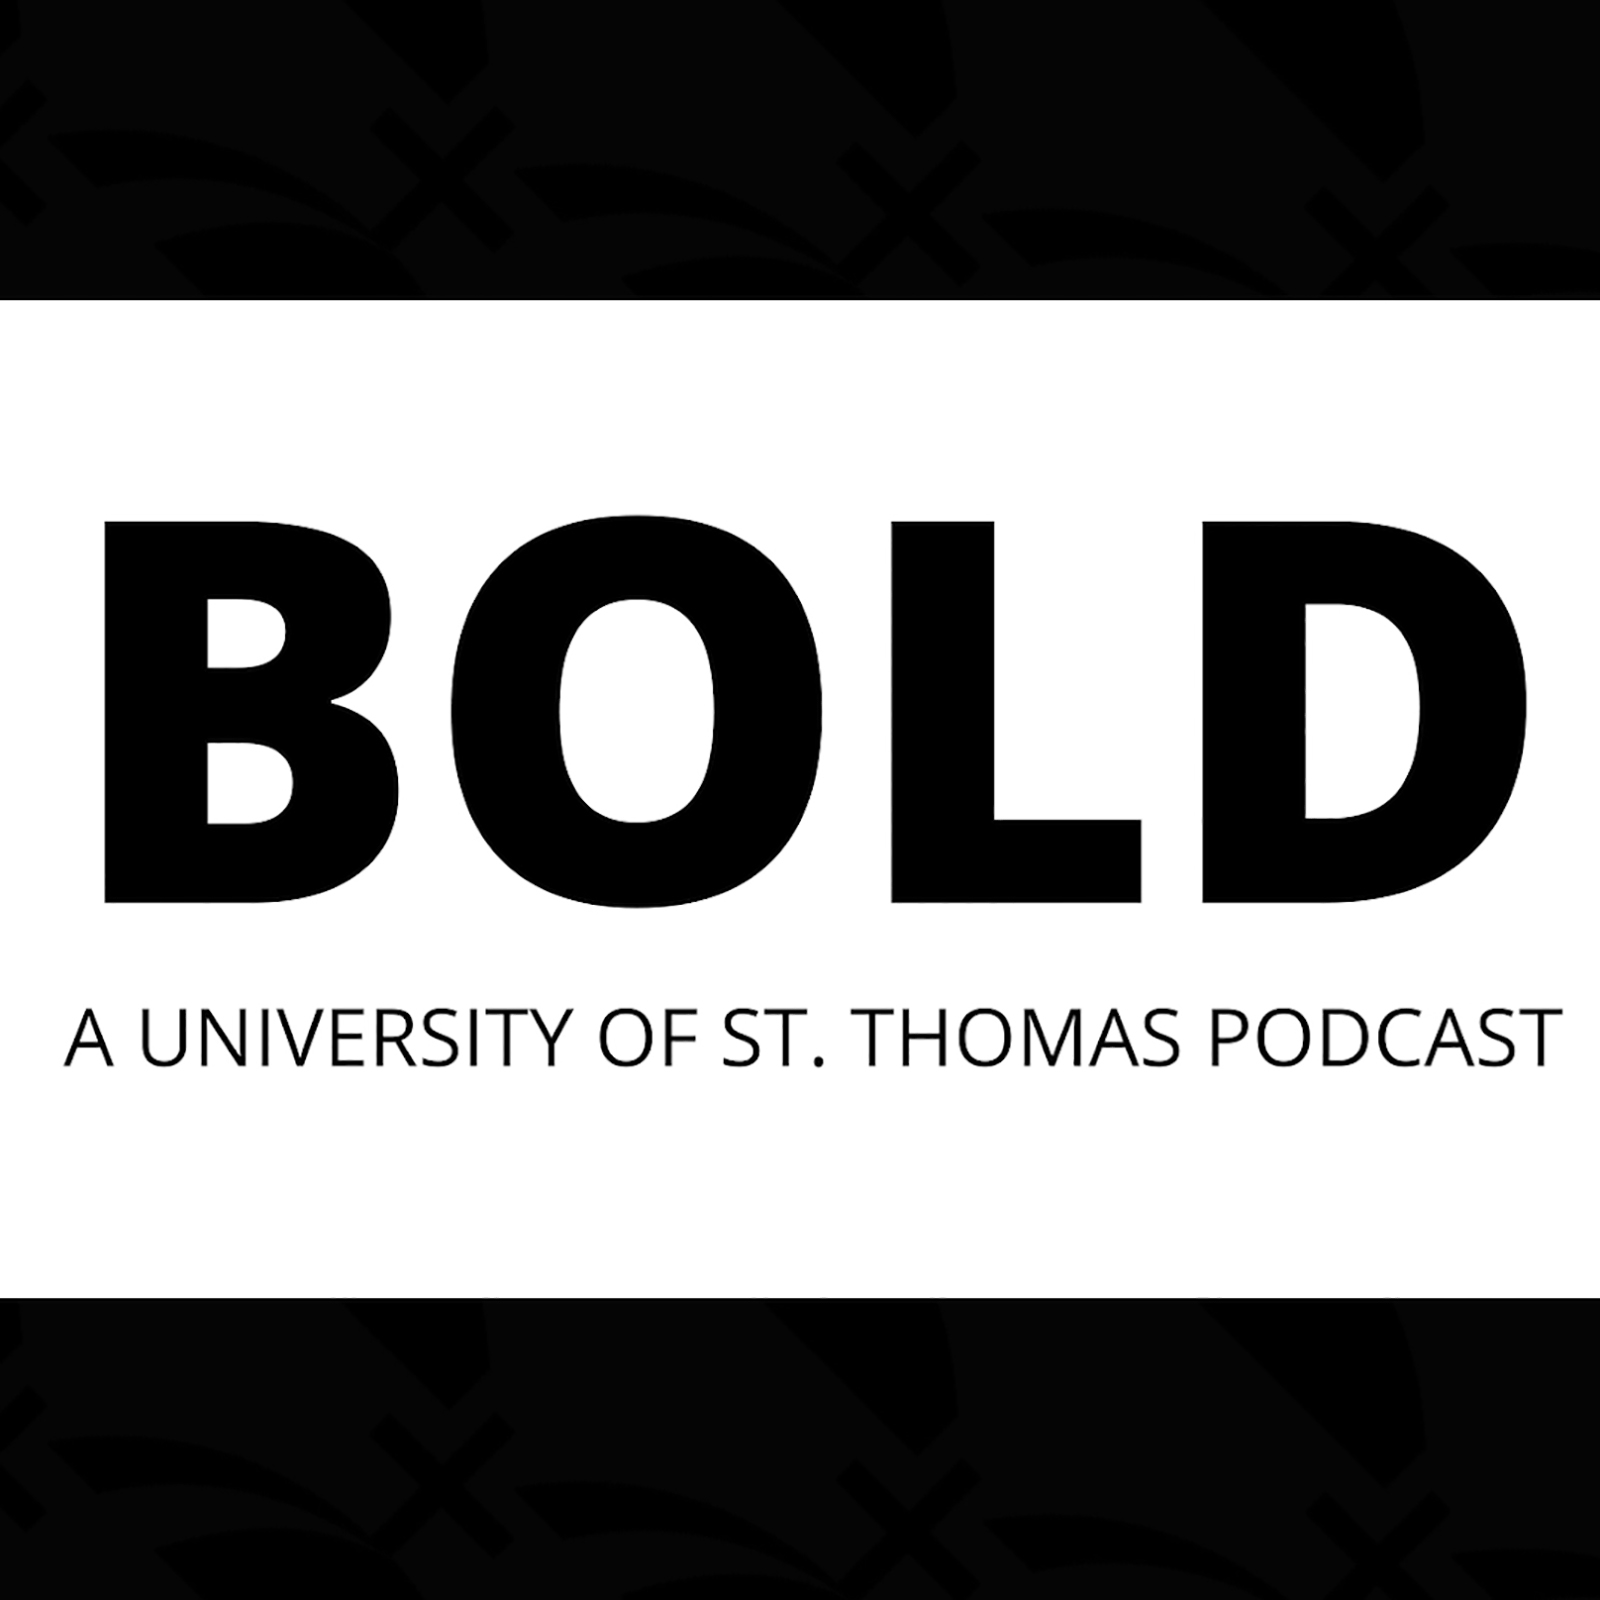 BOLD - A University of St. Thomas Podcast show art